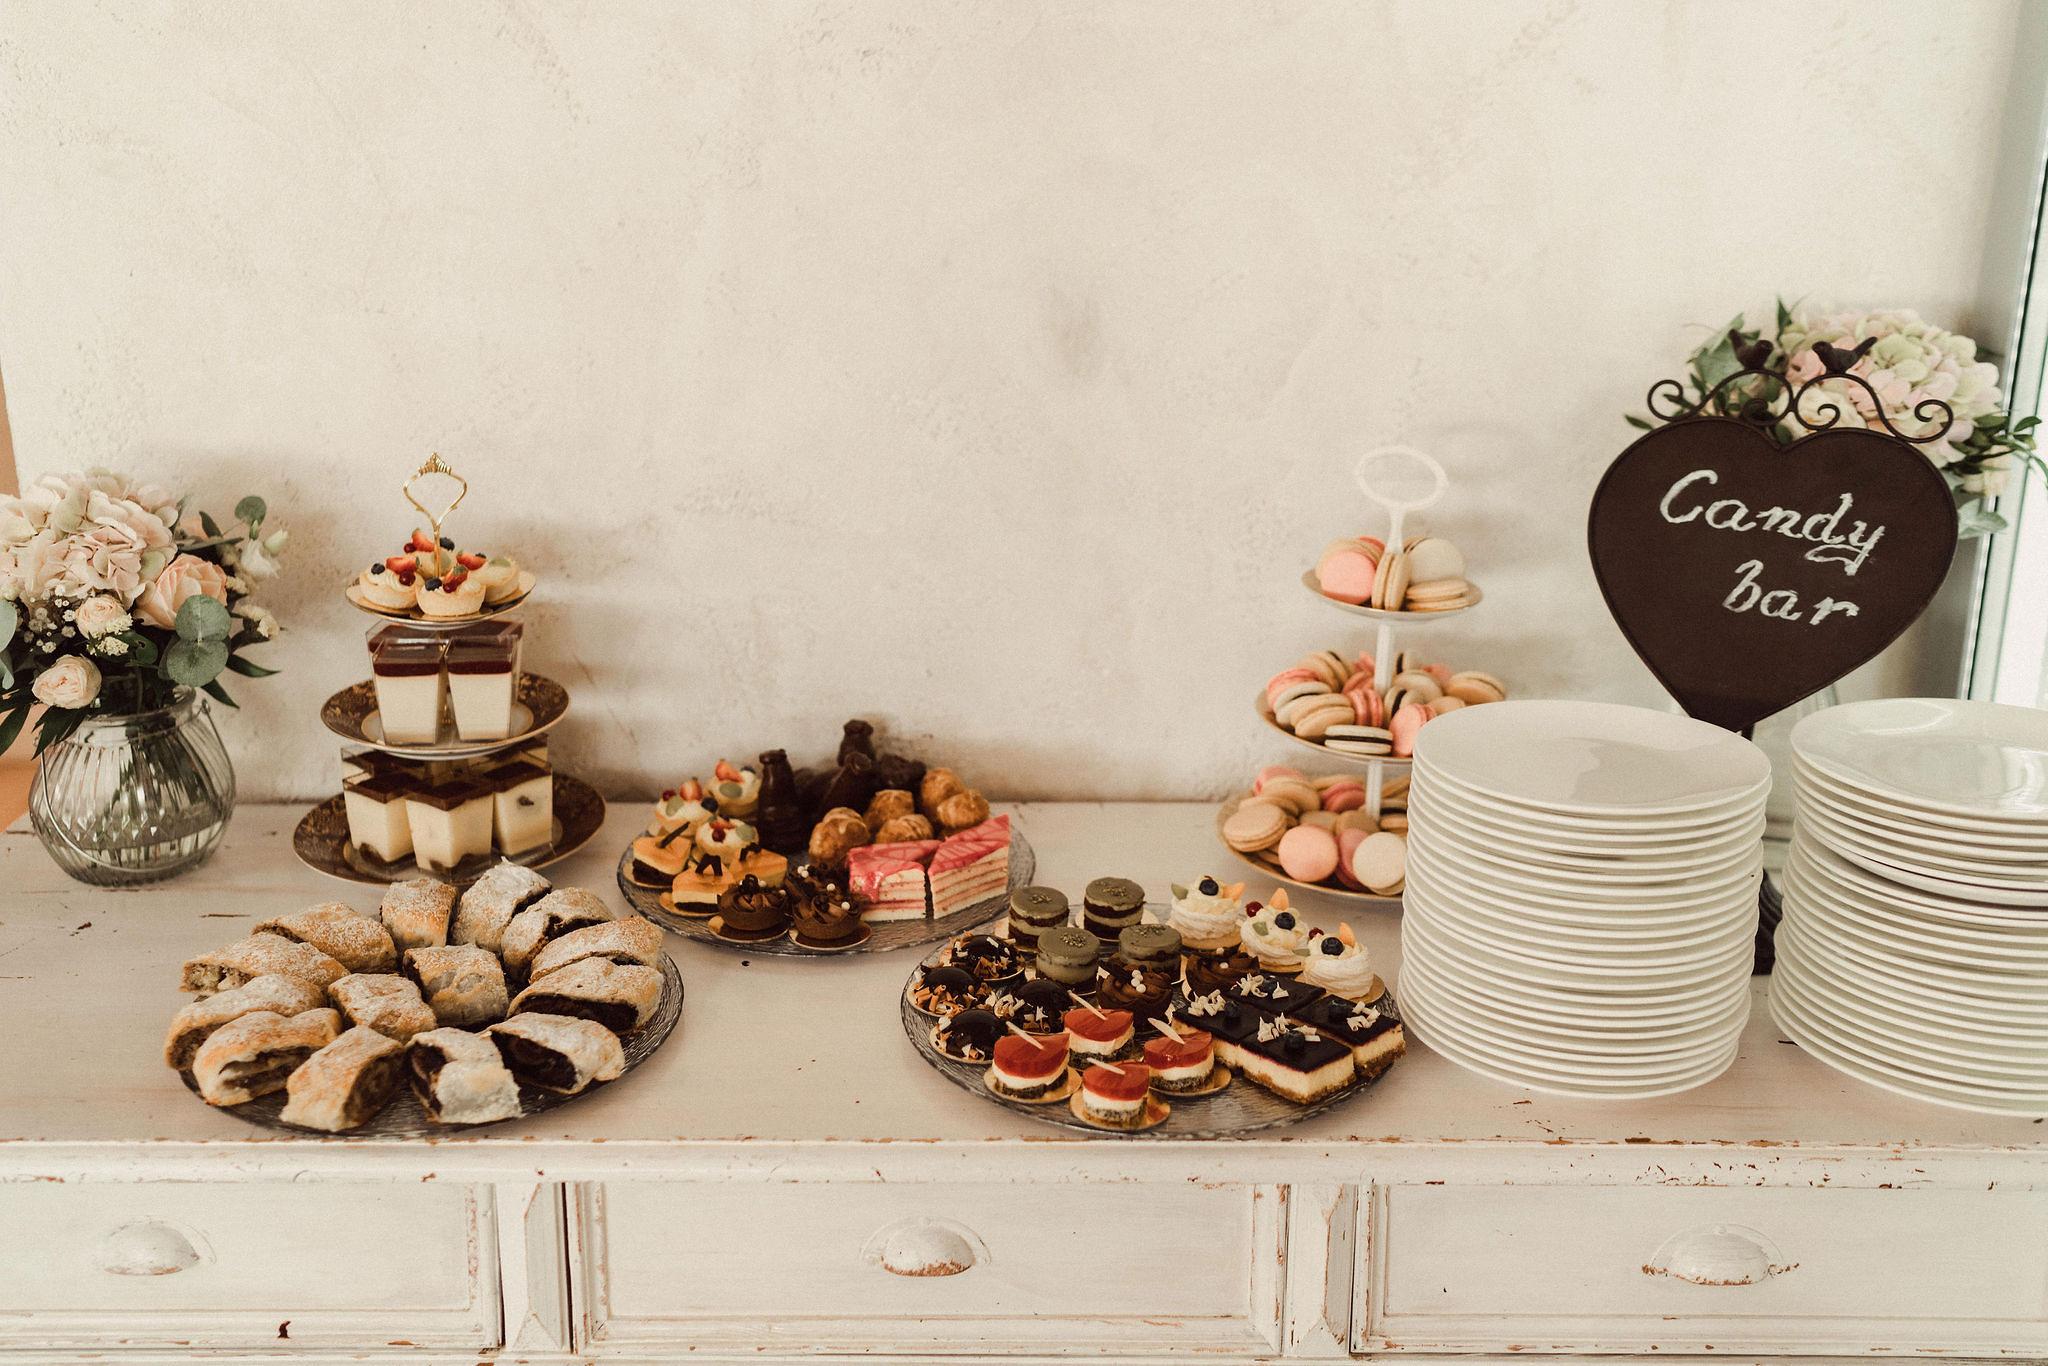 candy-bar-svadba-cenajpg